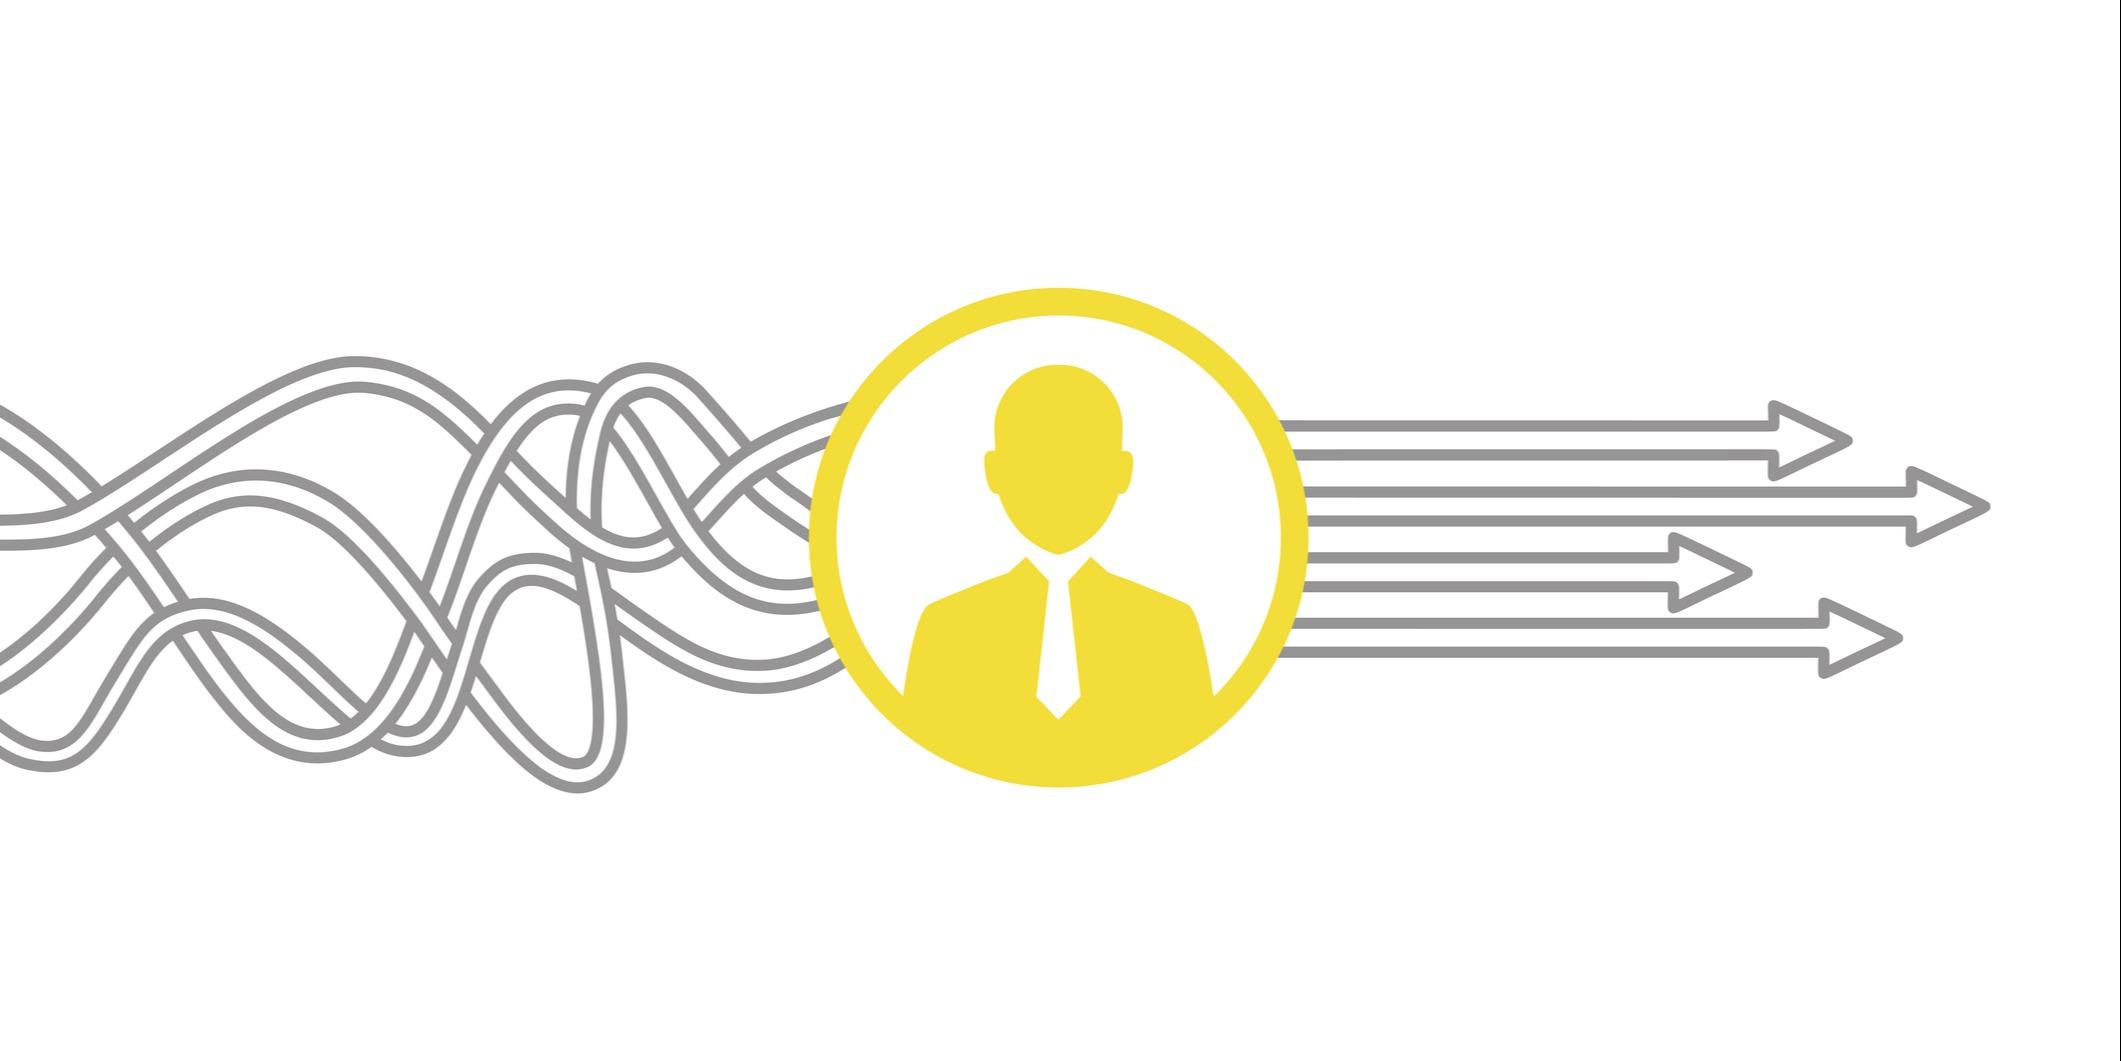 lead sales team through change